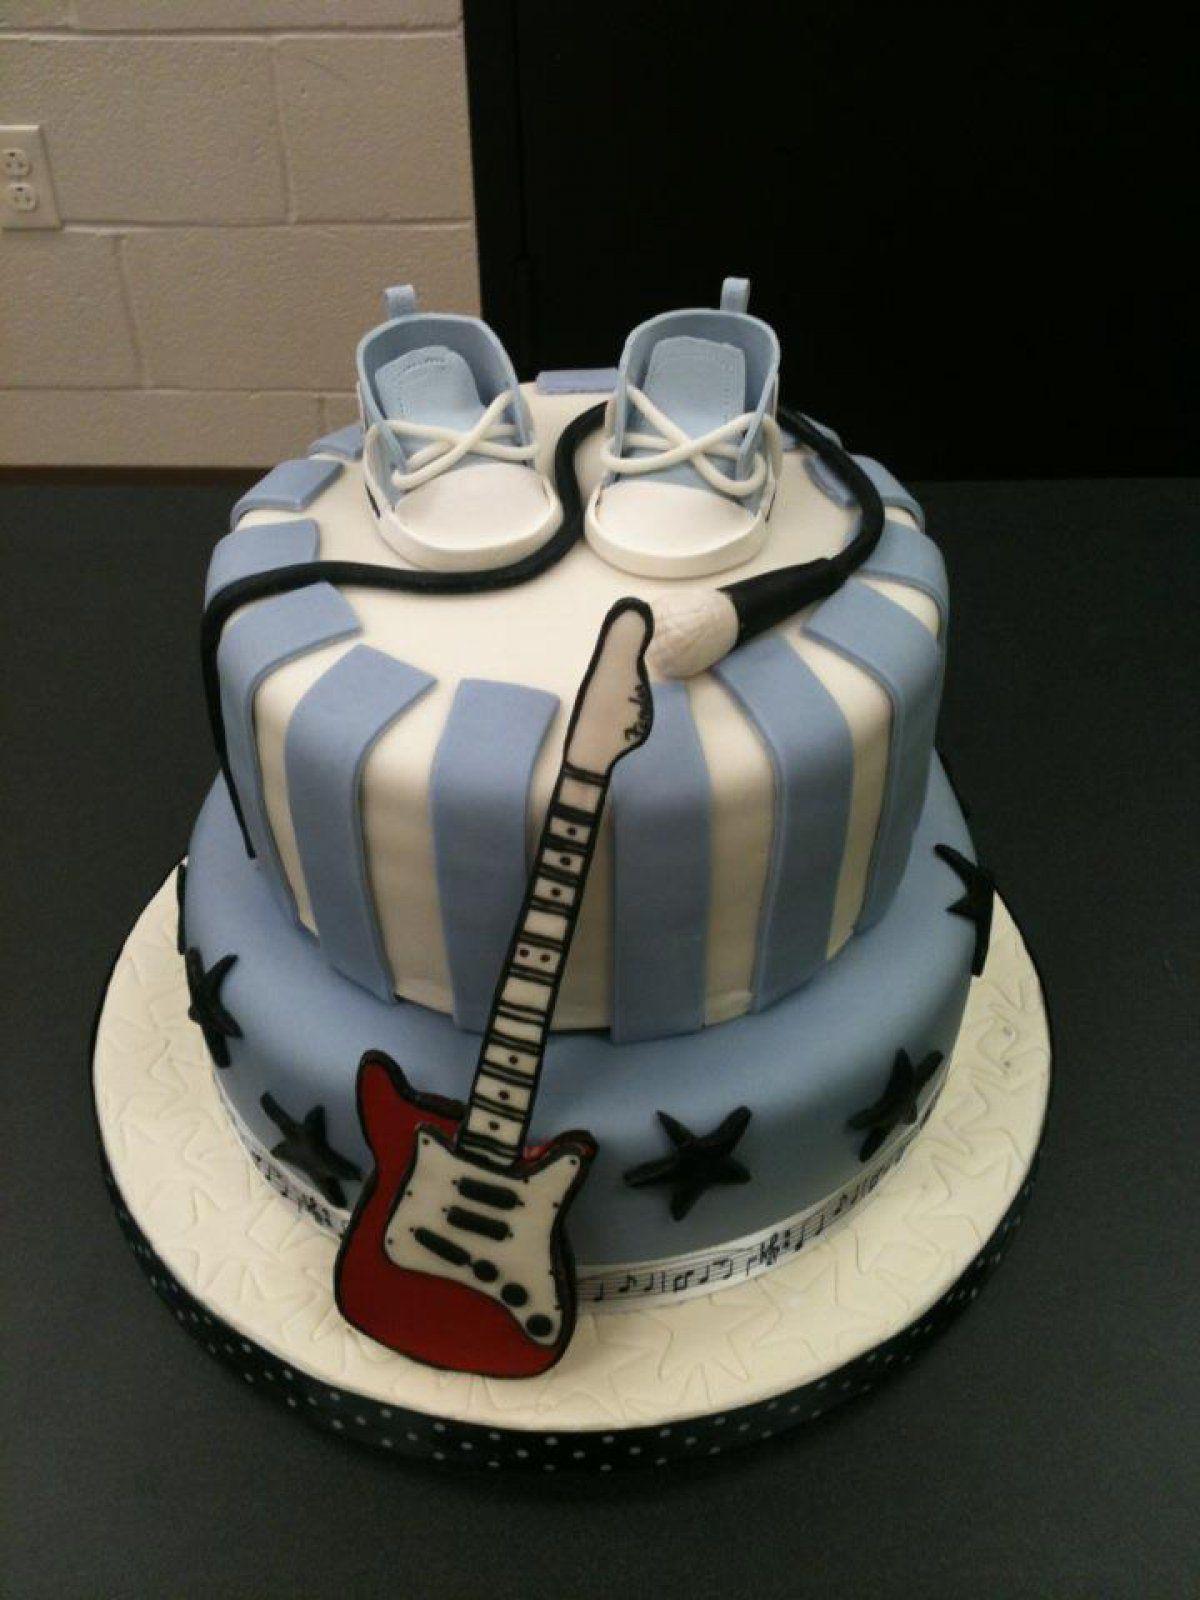 rock star baby shower cake baby shower inspiration pinterest star baby showers shower. Black Bedroom Furniture Sets. Home Design Ideas